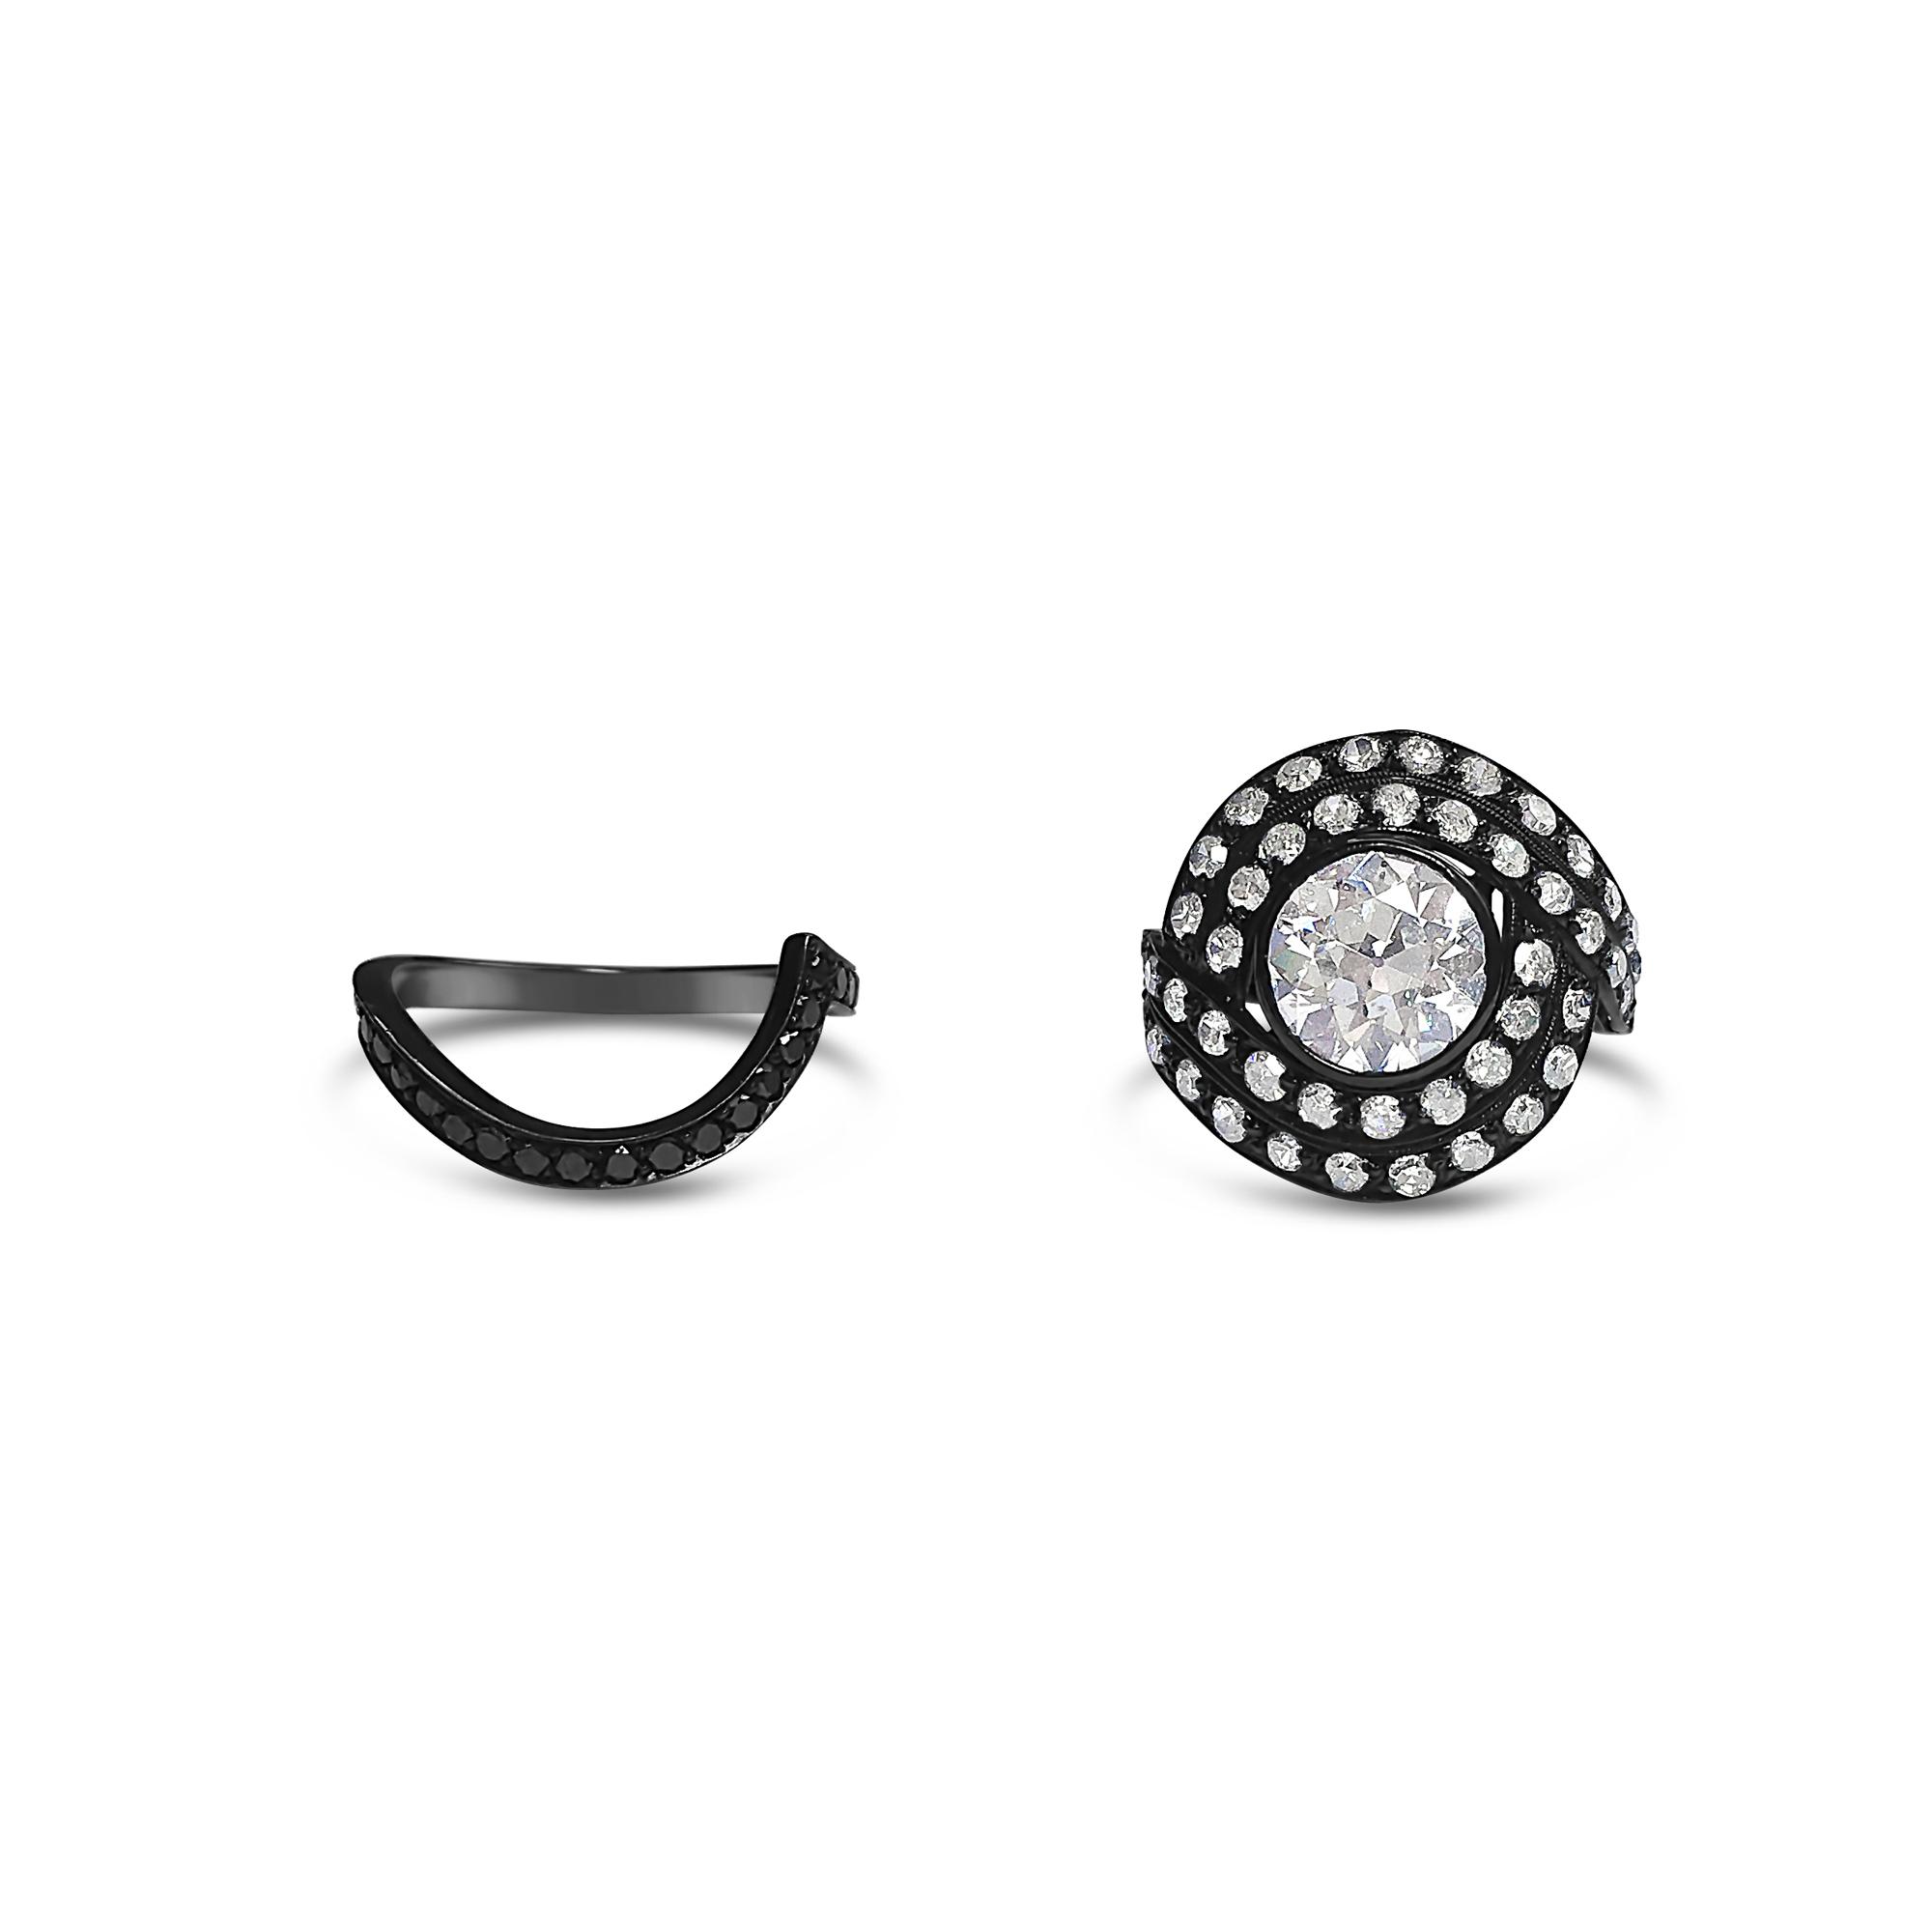 18ct-white-gold-black-rhodium-plated-black-diamond-fitted-wedding-ring-2.jpg